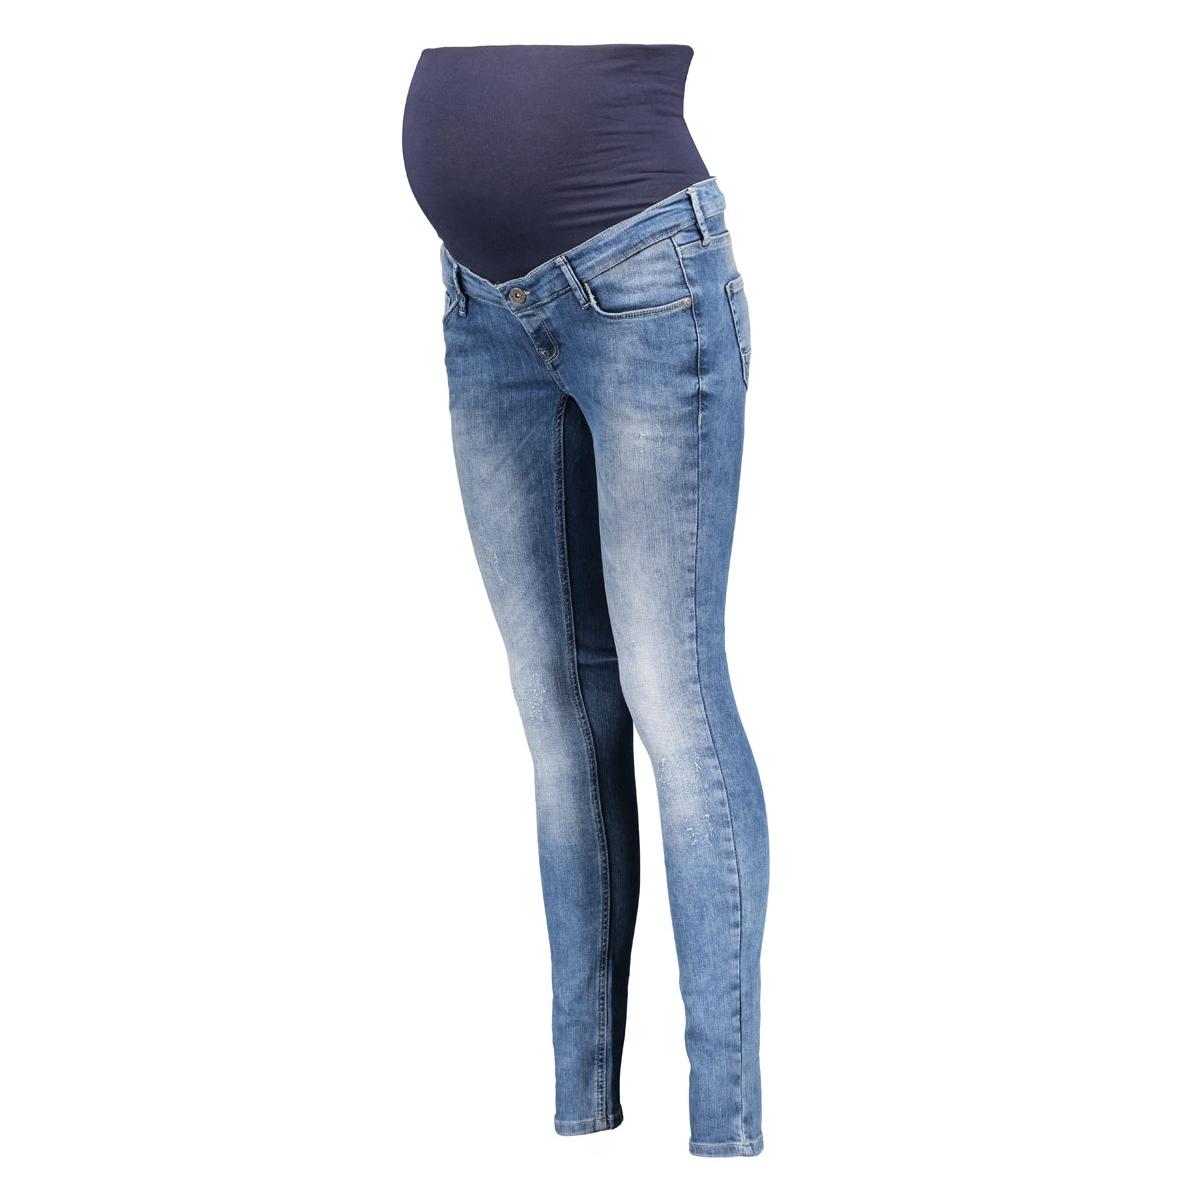 s0355 jeans otb skinny supermom positie broek med blue